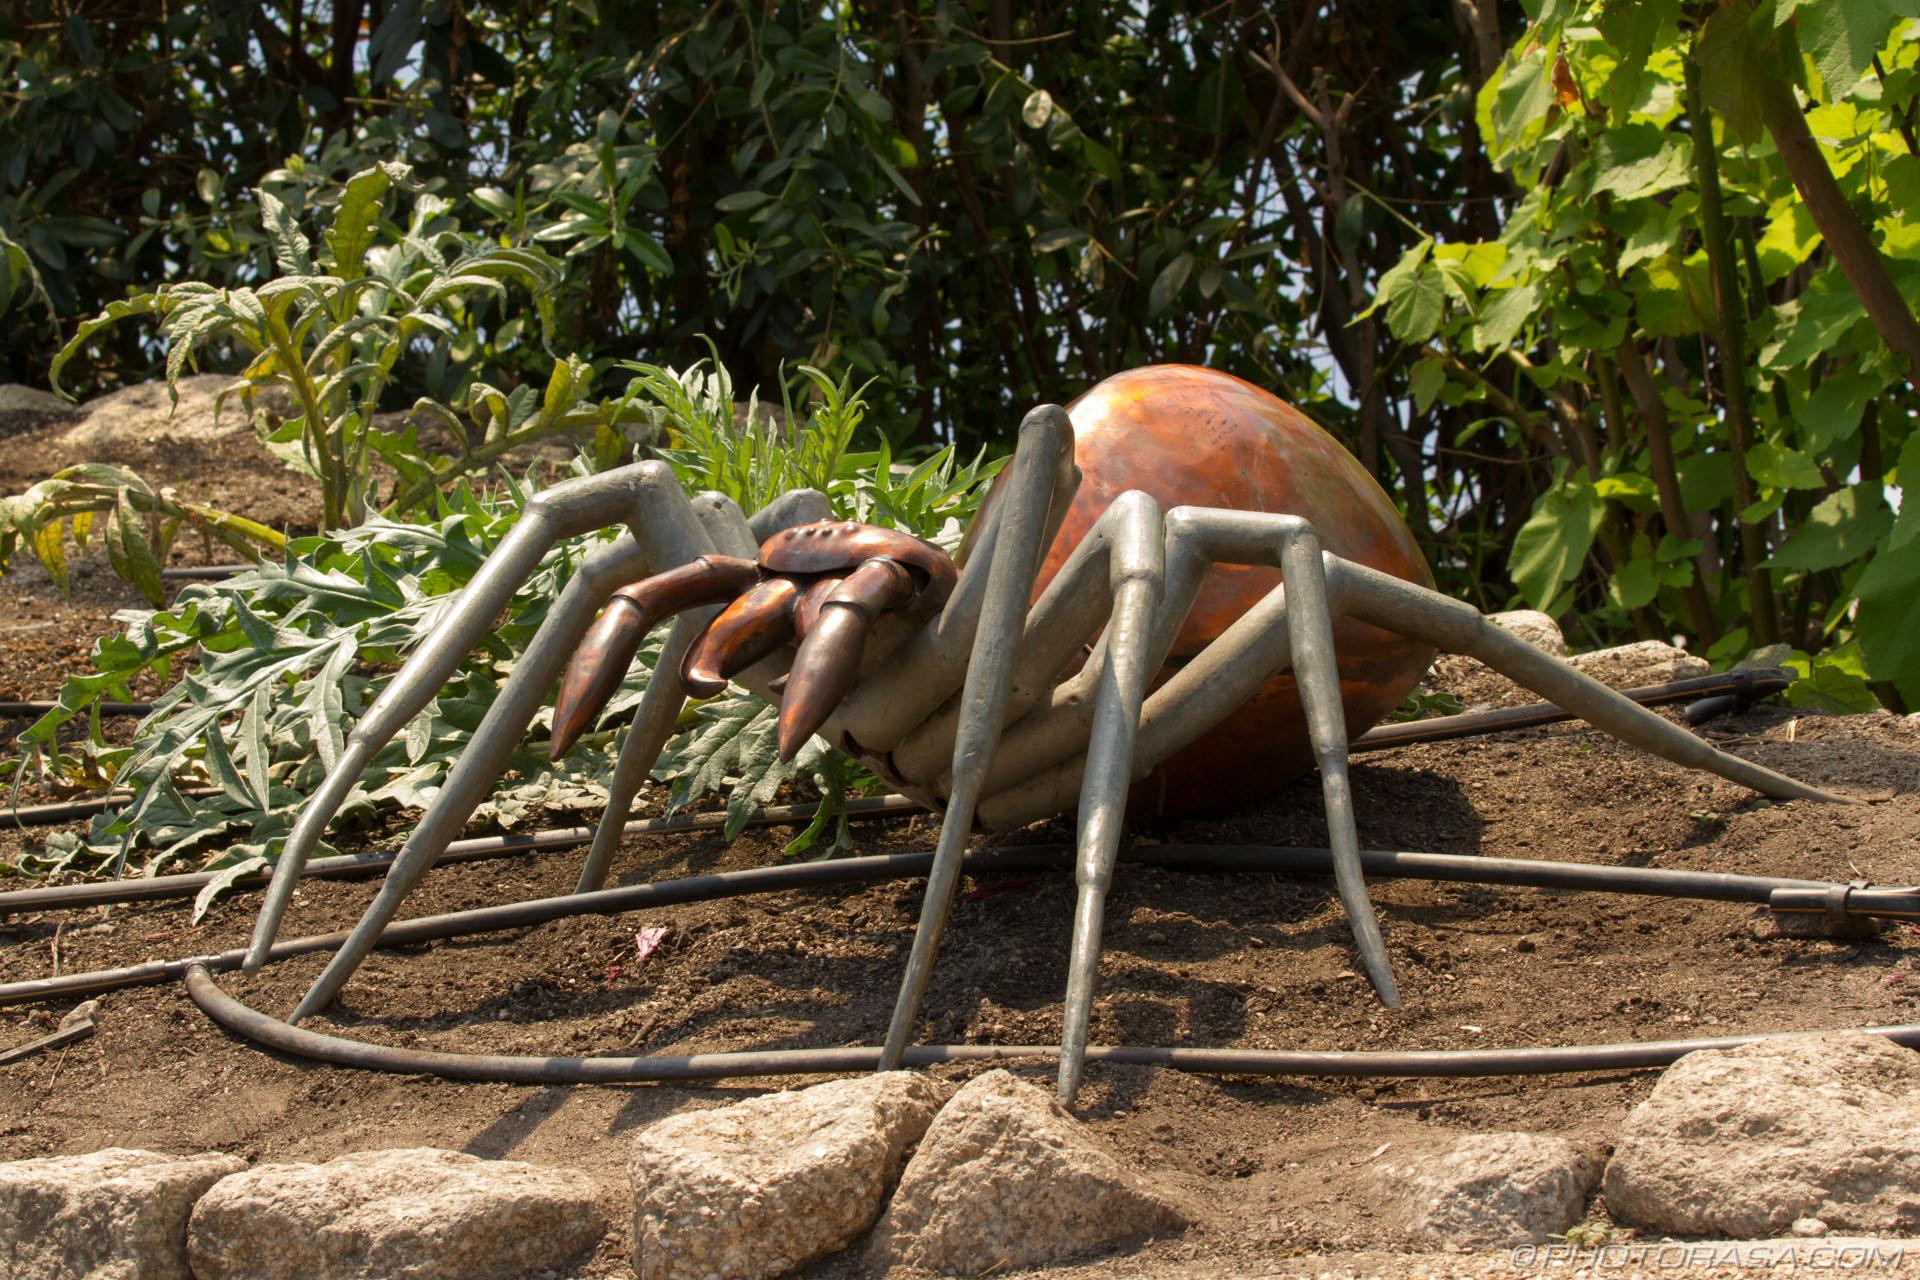 https://photorasa.com/garden-sculptures/metal-spider-sculpture/